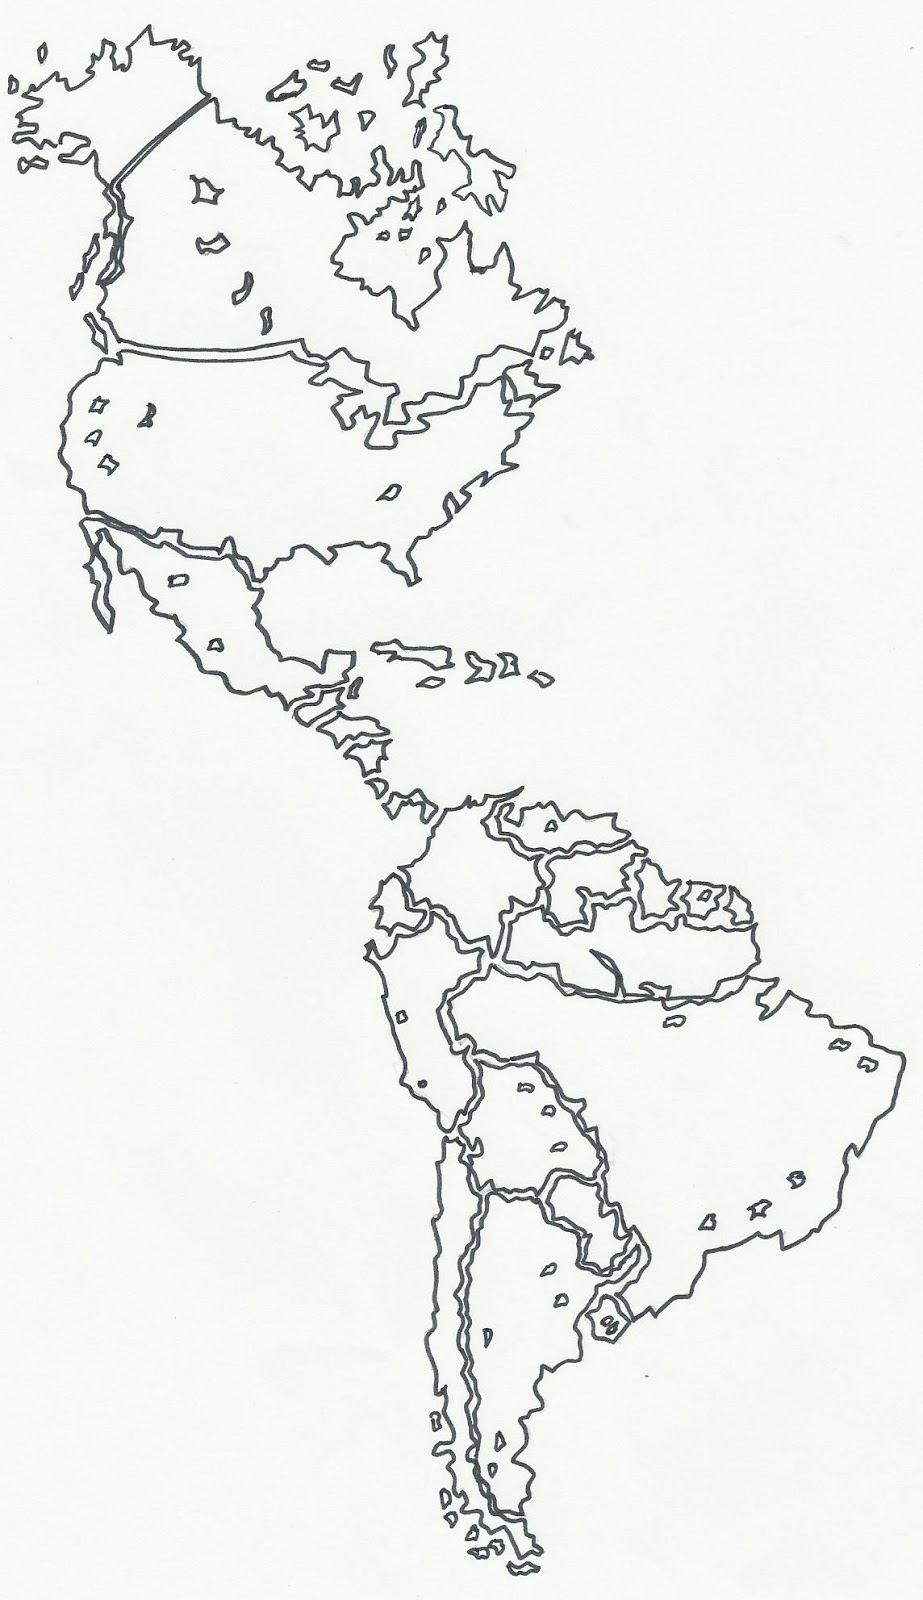 GEOGRAFIA DEL PERU Y DEL MUNDO-DIBUJOS-IMAGENES: DIBUJO-MAPA DEL ...